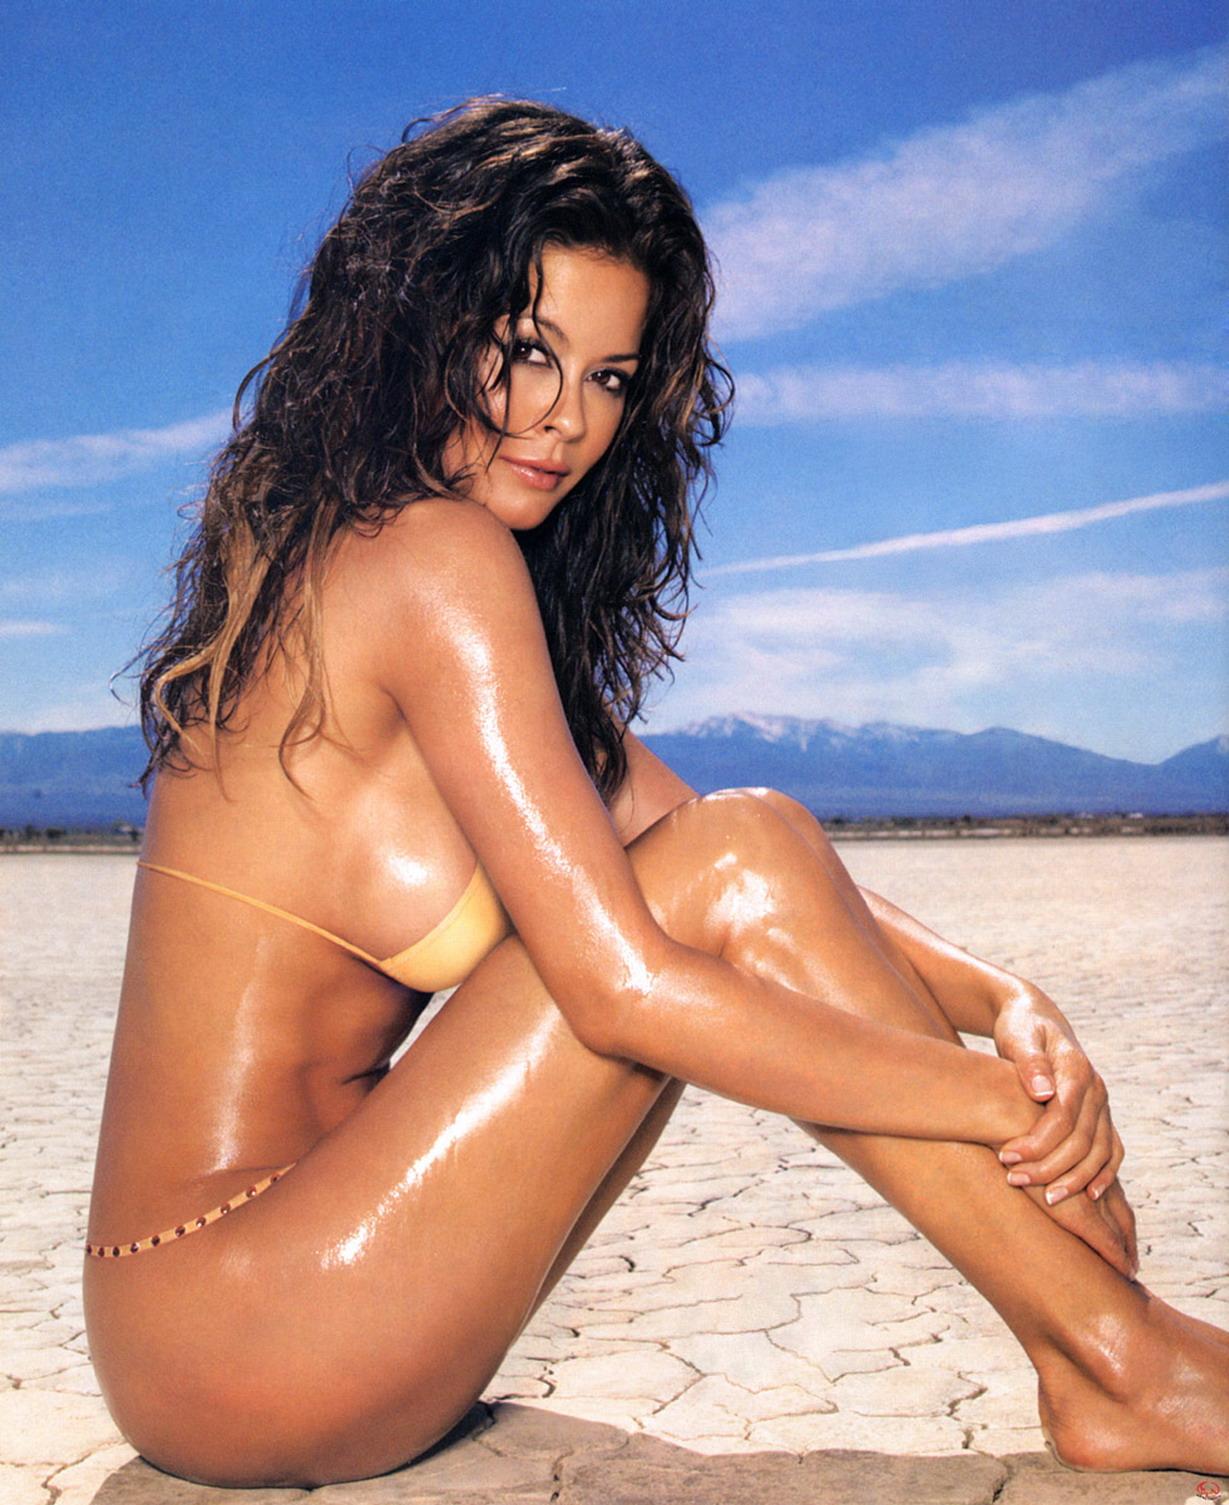 Brooke burke nude gallery